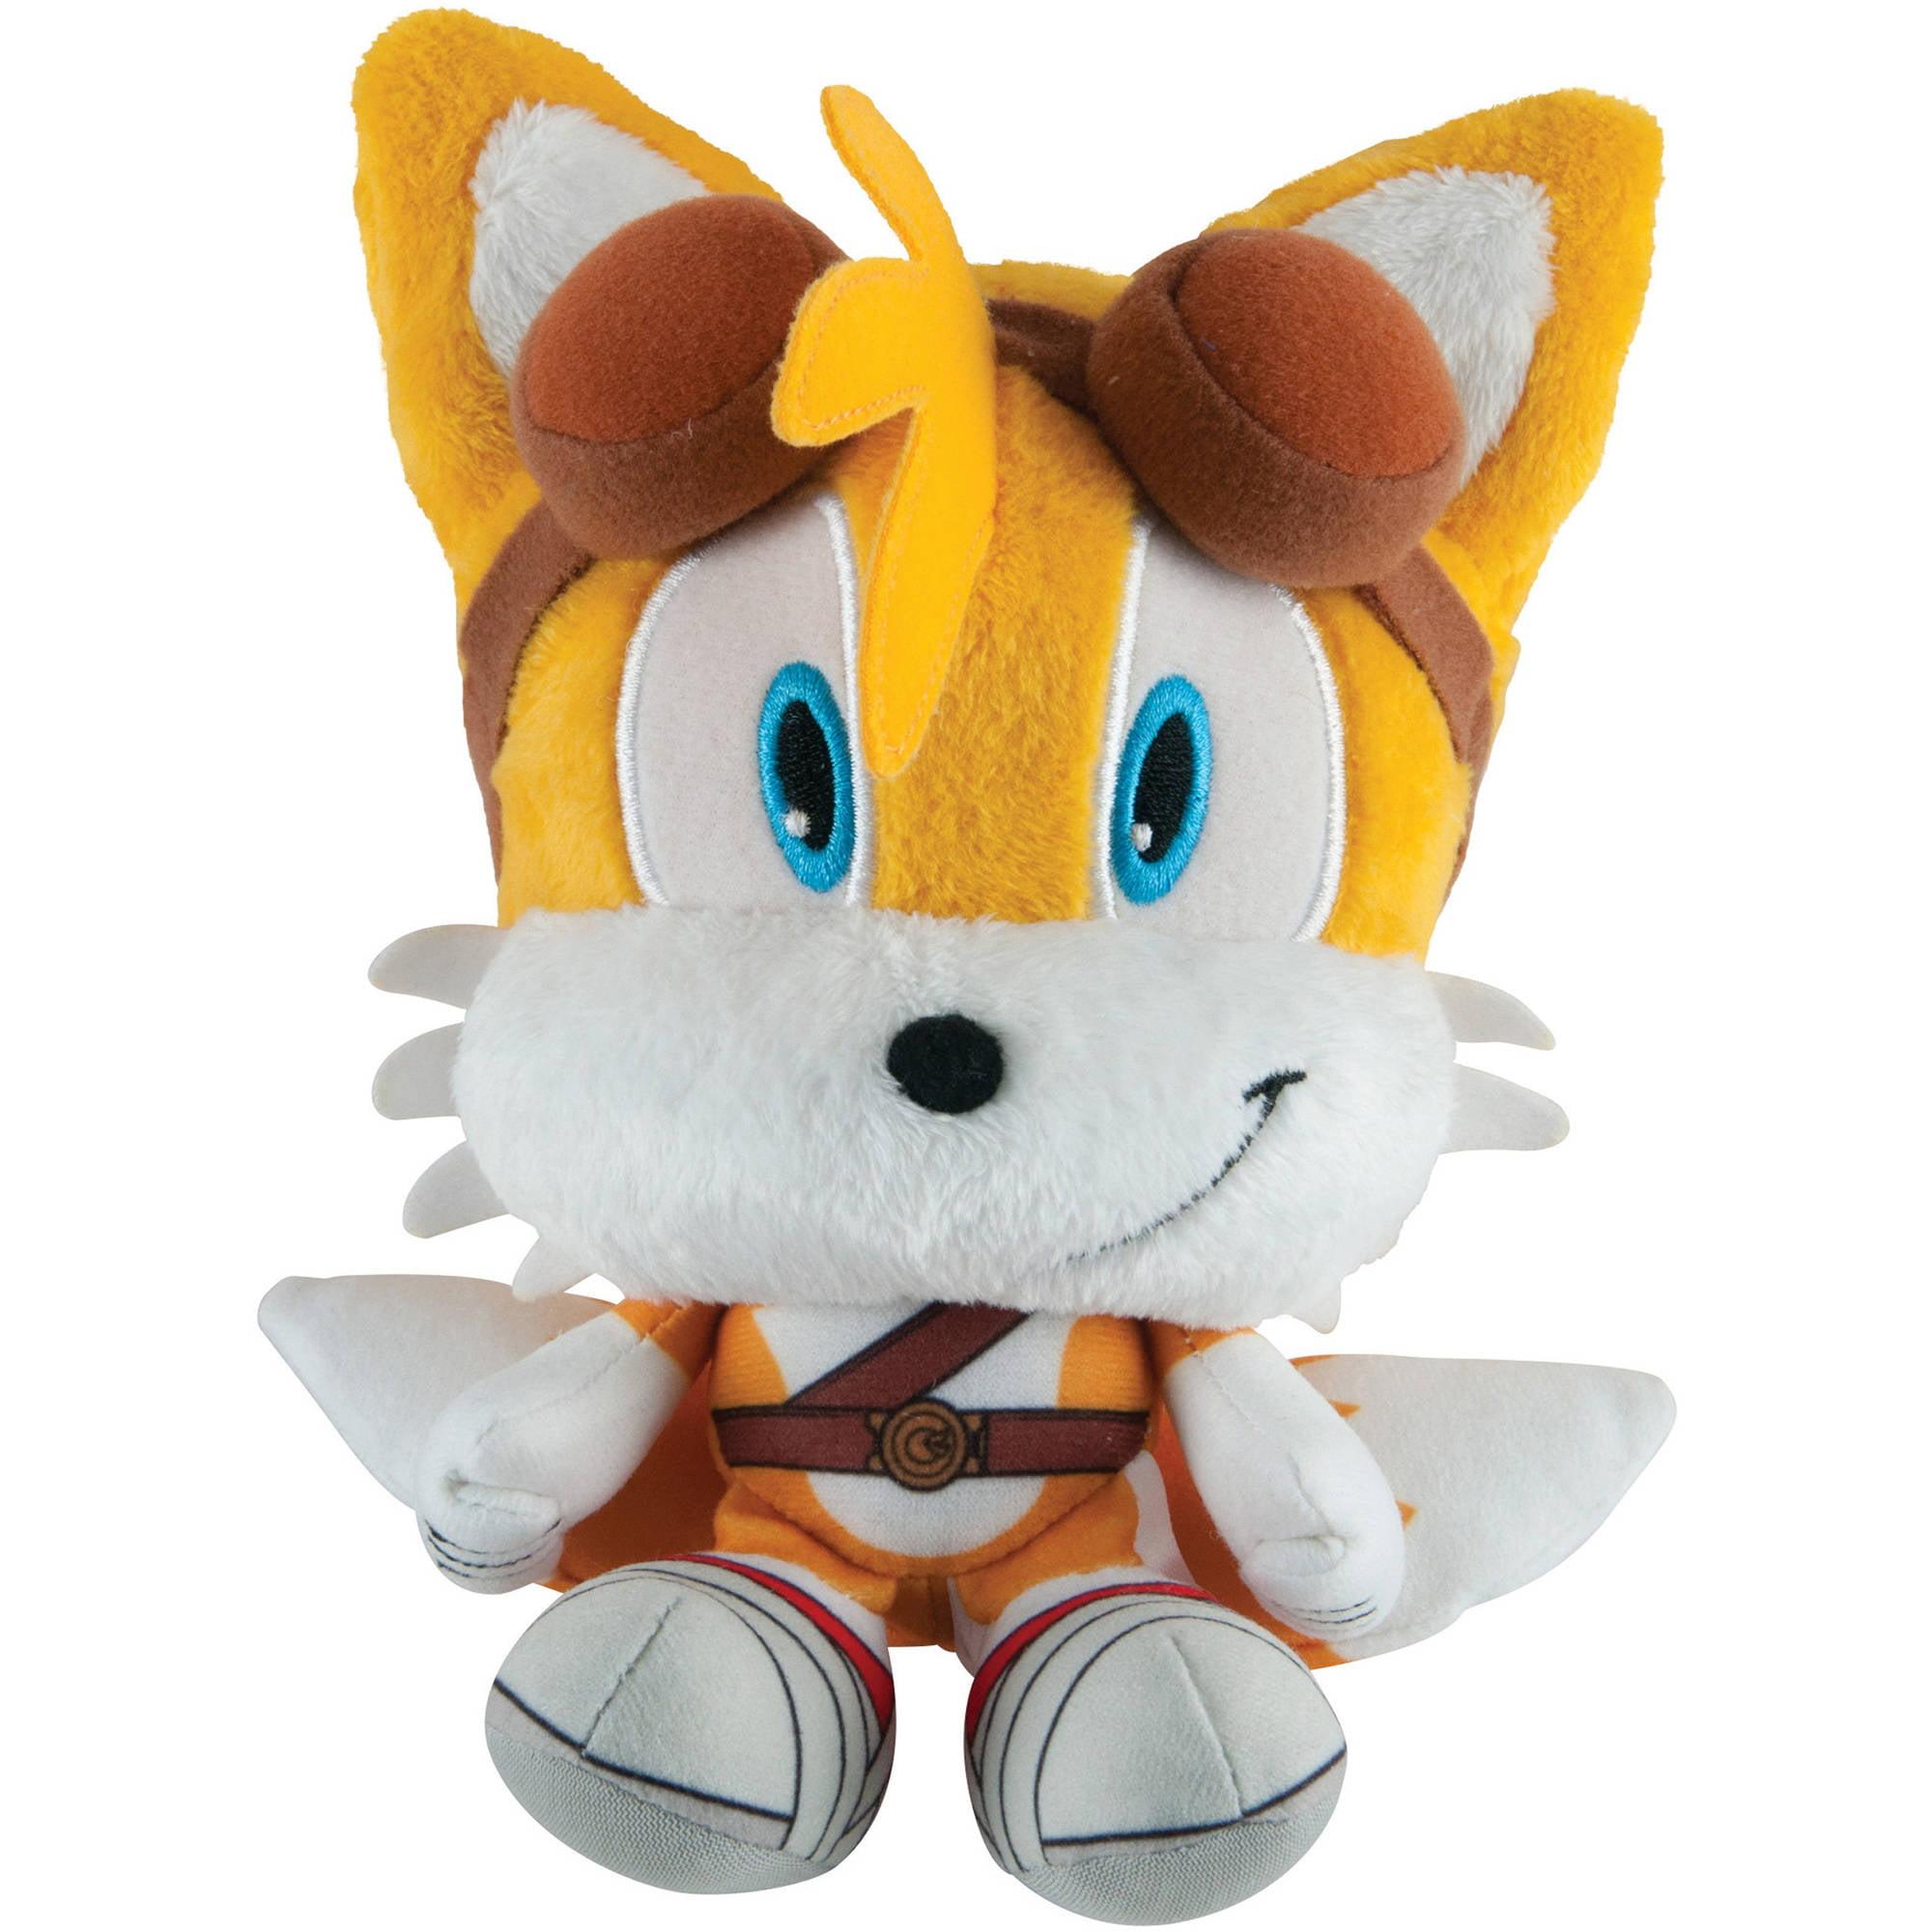 TOMY Sonic Boom Head Plush, Tails